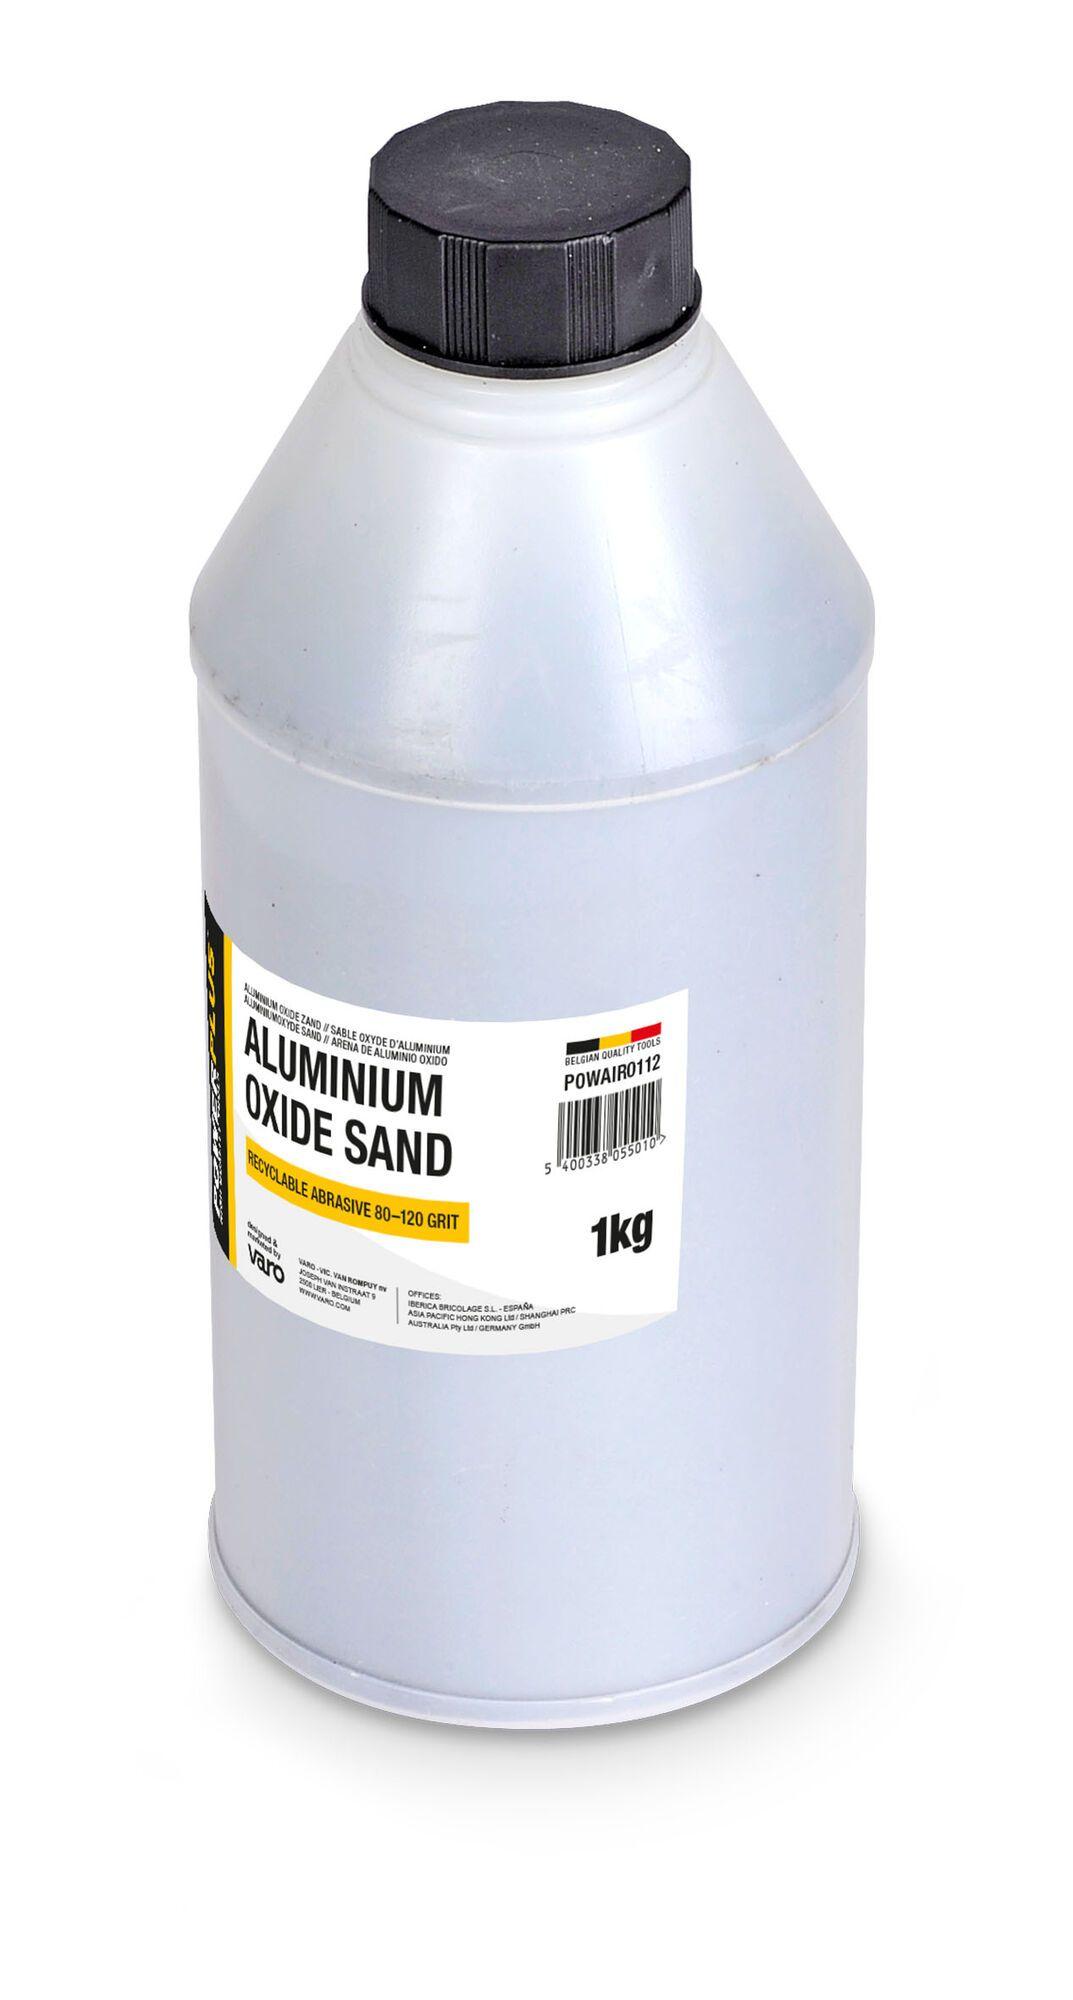 Powerplus POWAIR0112 Aluminium oxide poeder voor zandstraler | 1kg